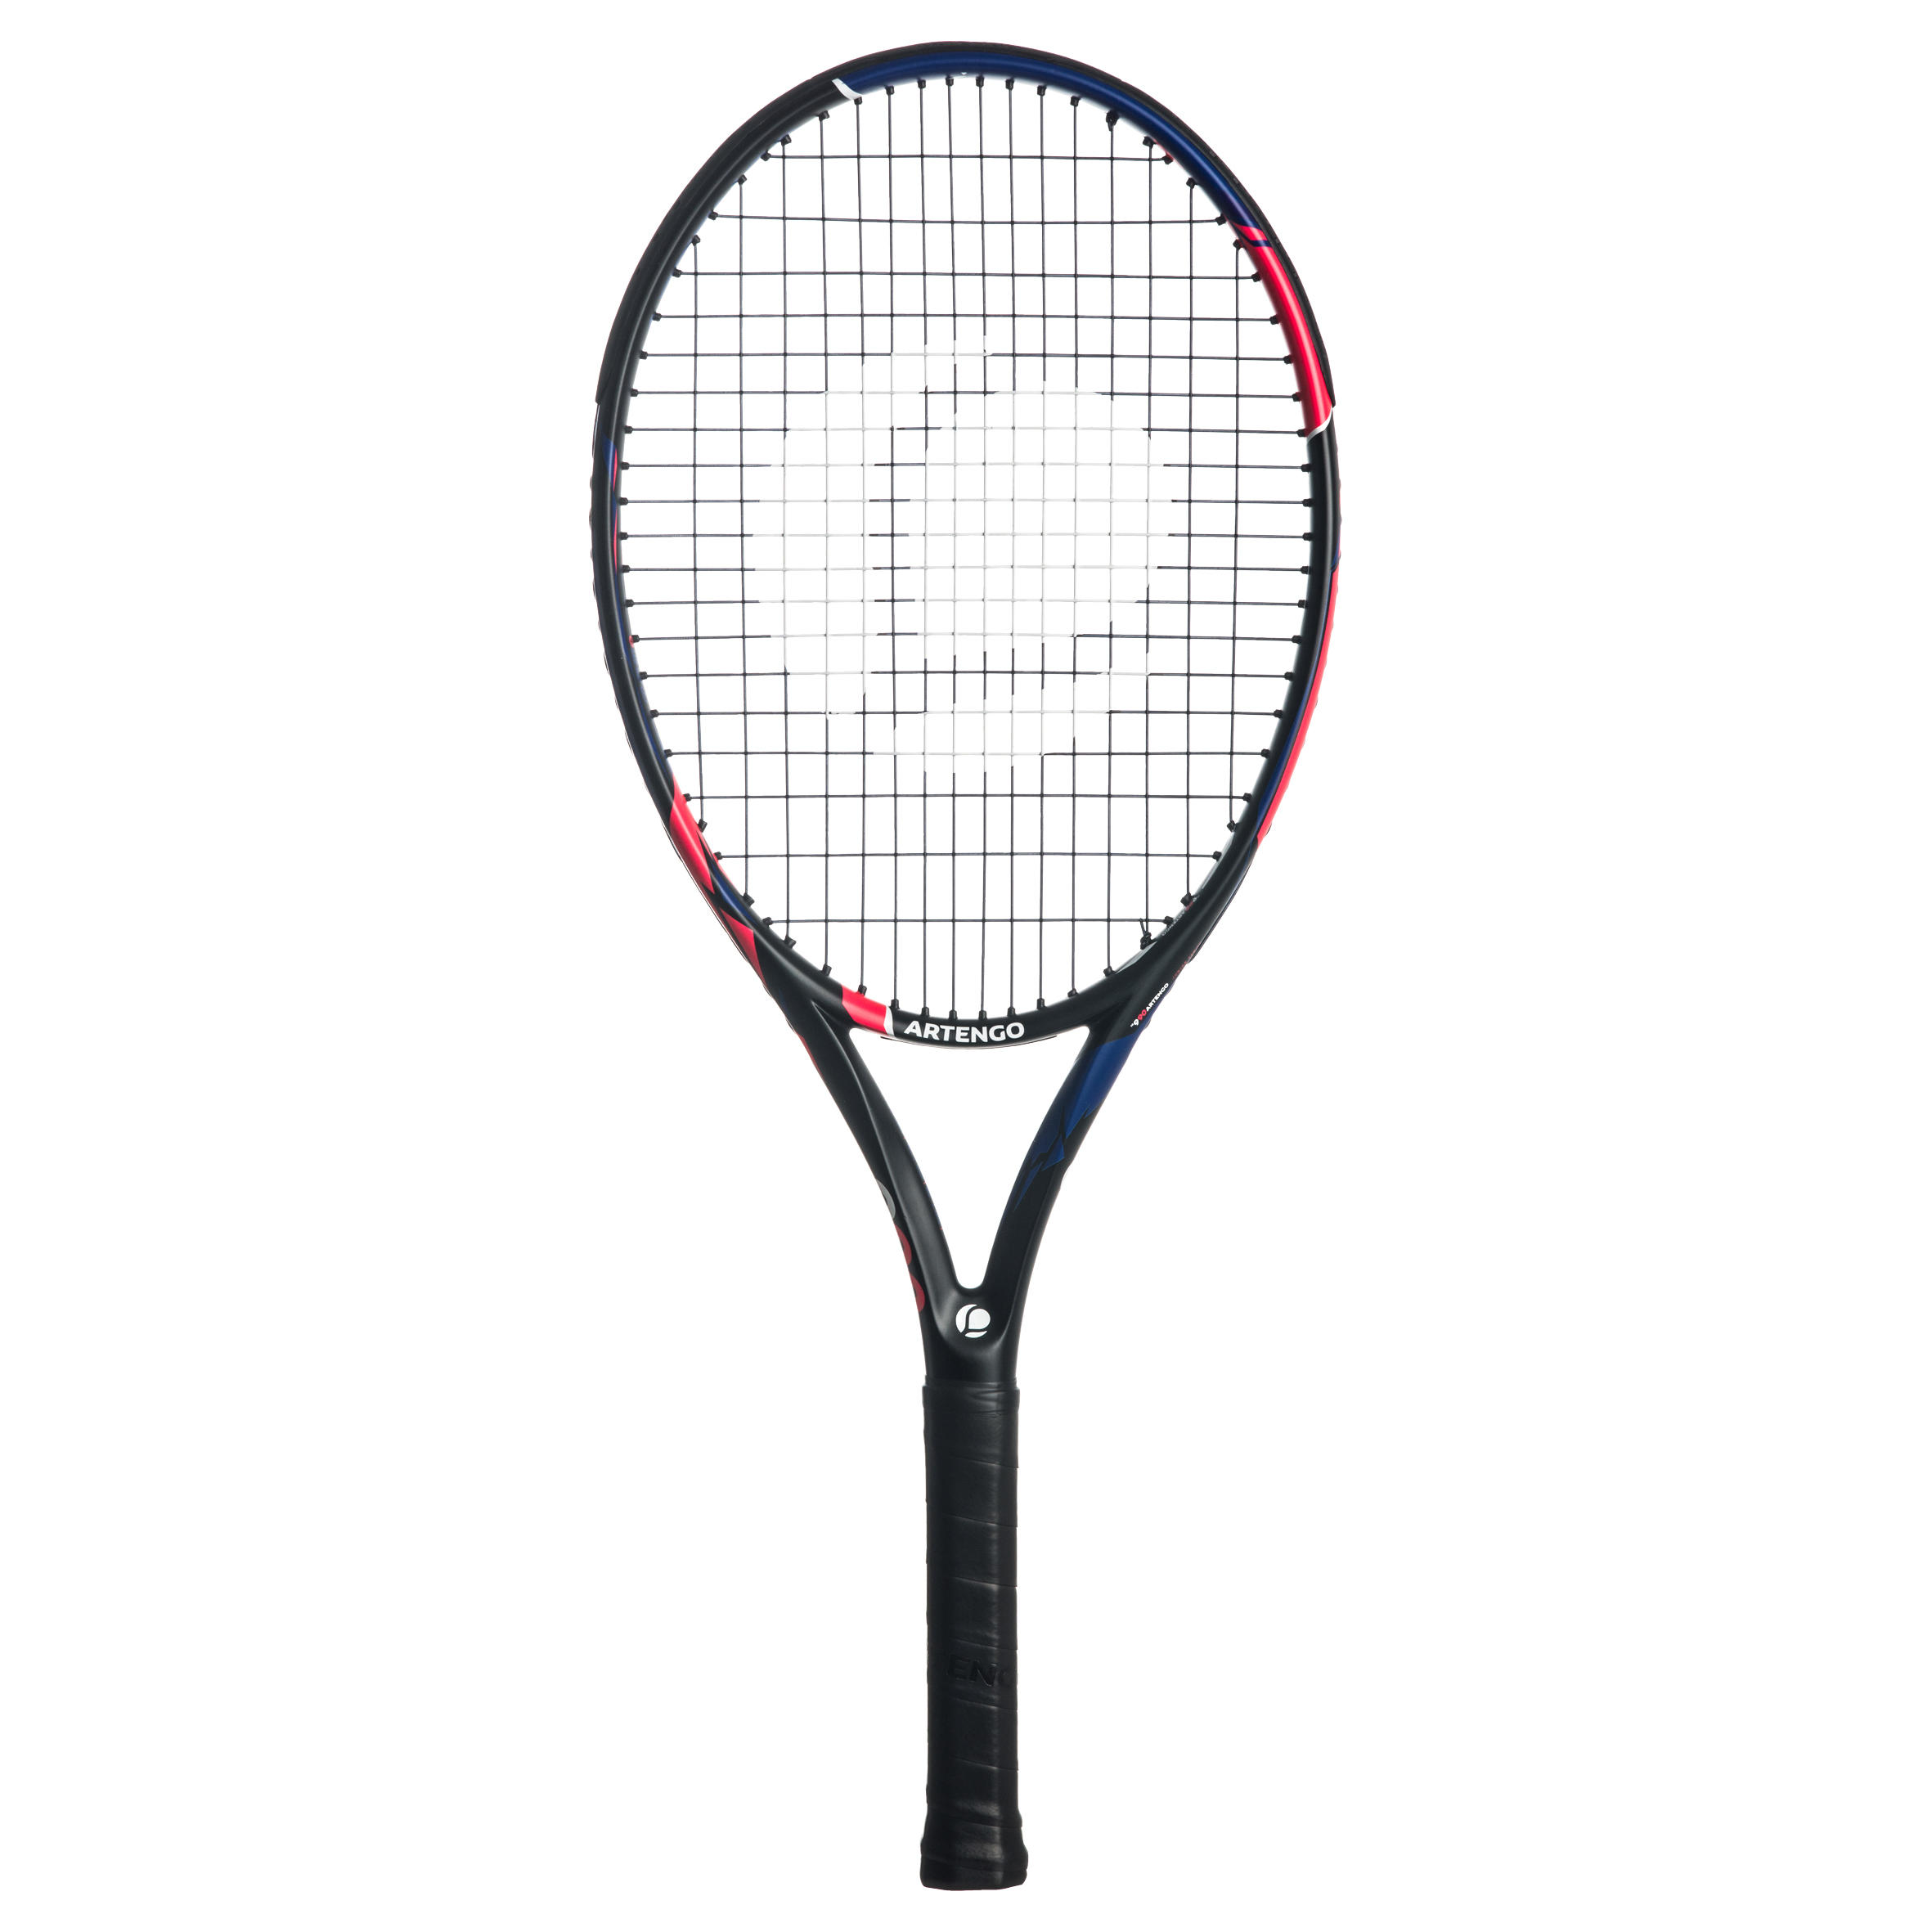 Rachetă Tenis TR900 M26 Copii